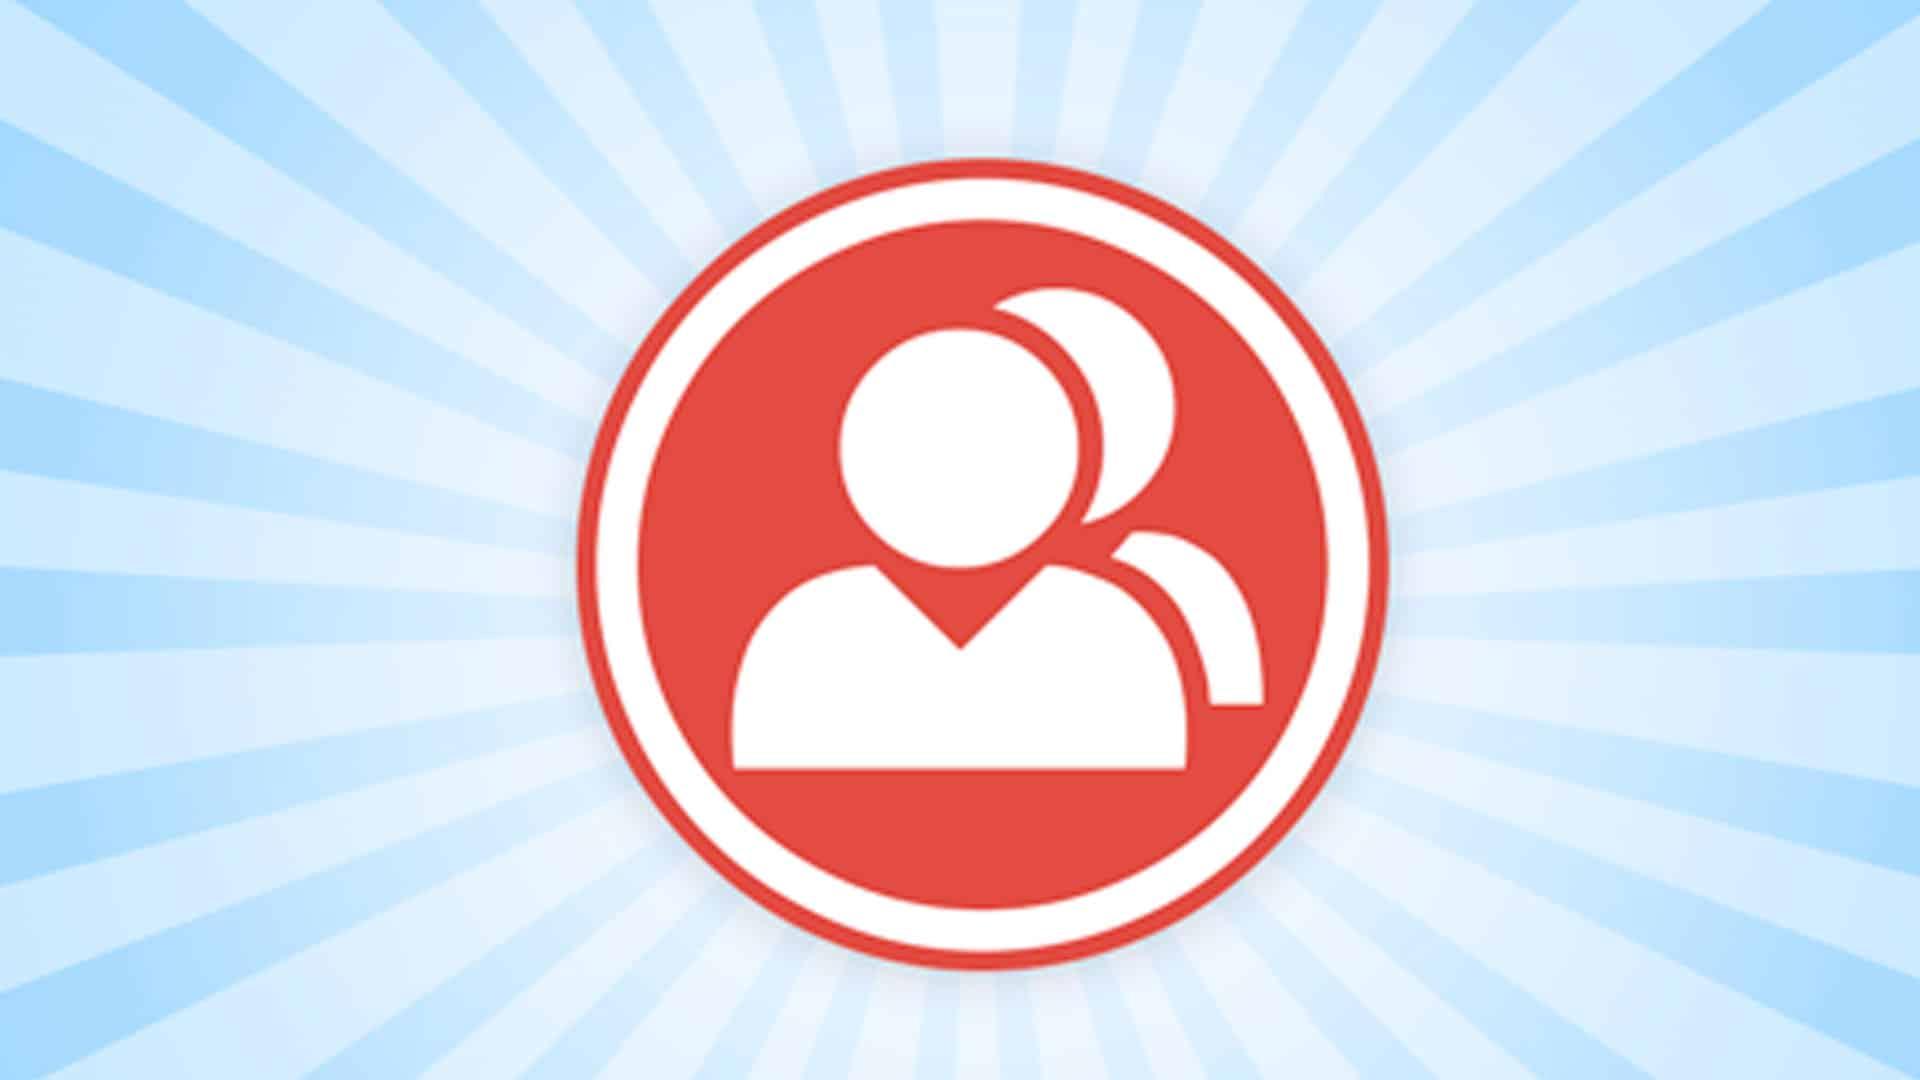 BuddyPress 101 Webinar - Lisa Sabin-Wilson and Cory Miller